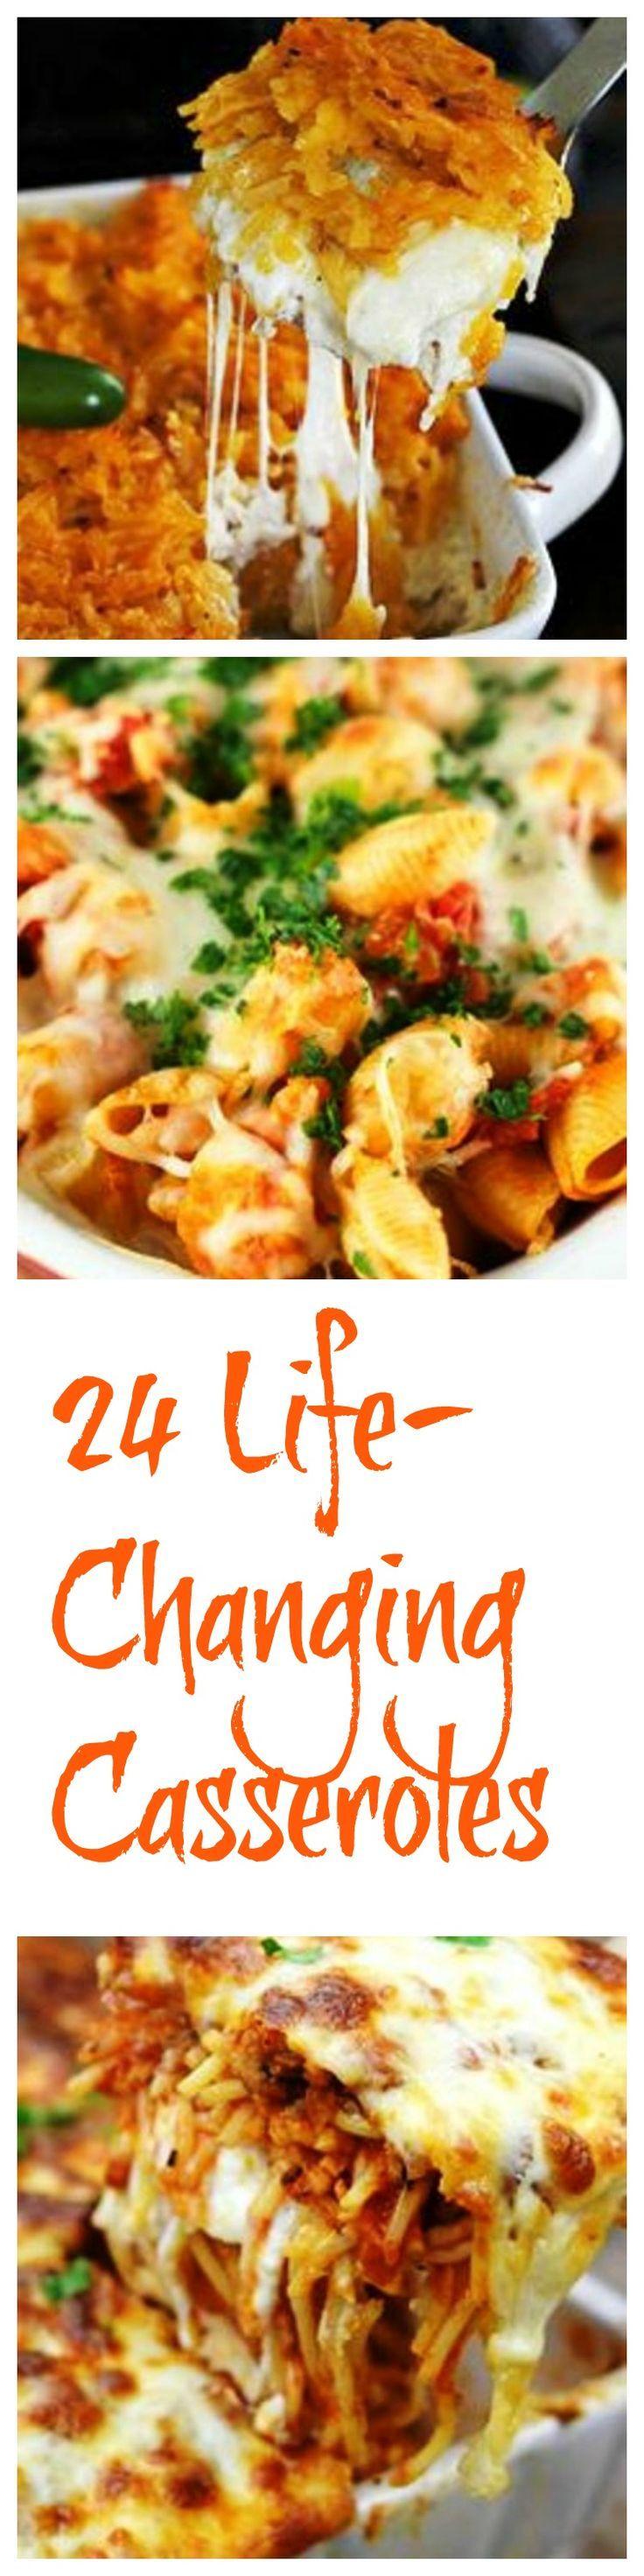 24 Life-Changing Casseroles